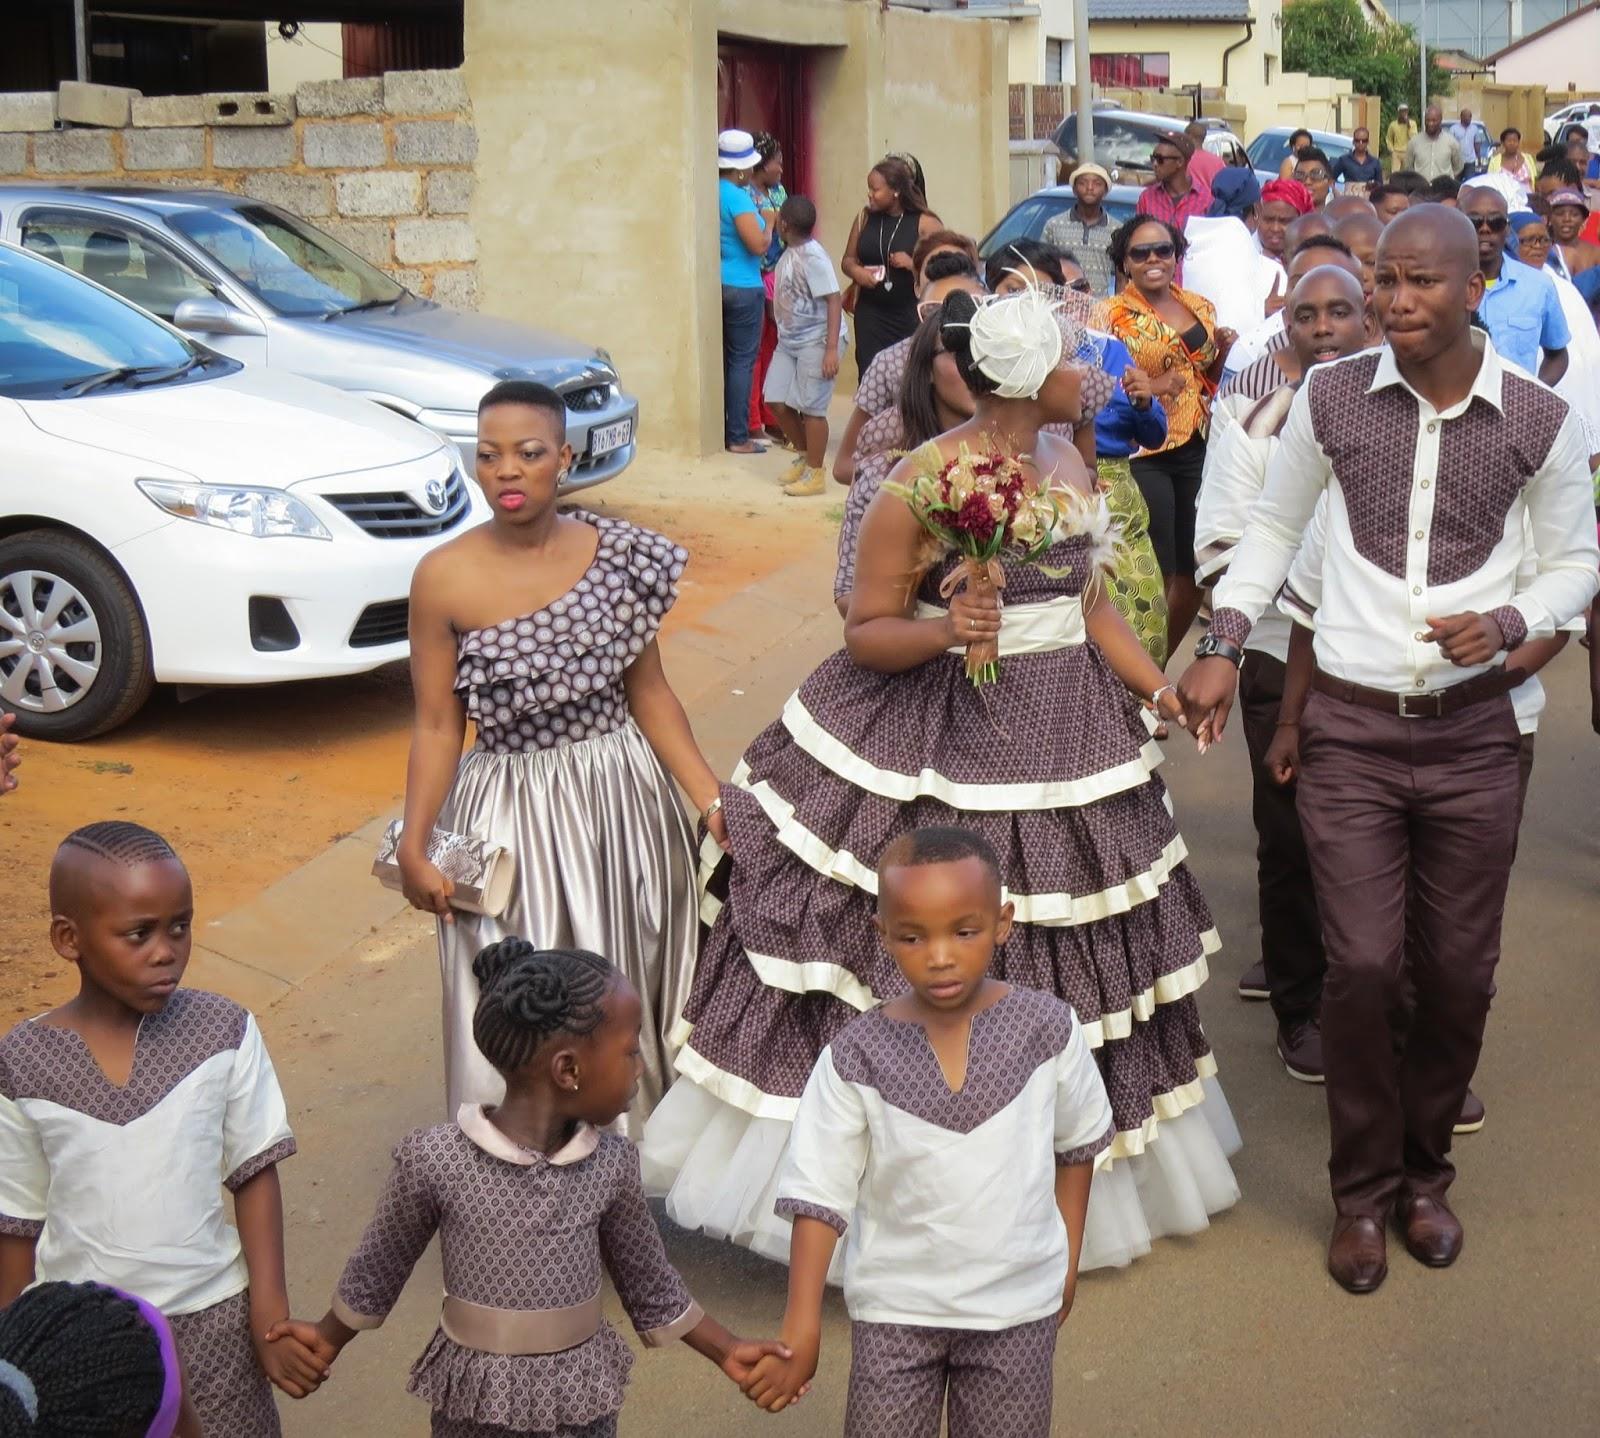 Paballo%2BSeipei traditional wedding Lebo%2B(26) - Traditional Wedding Who Pays